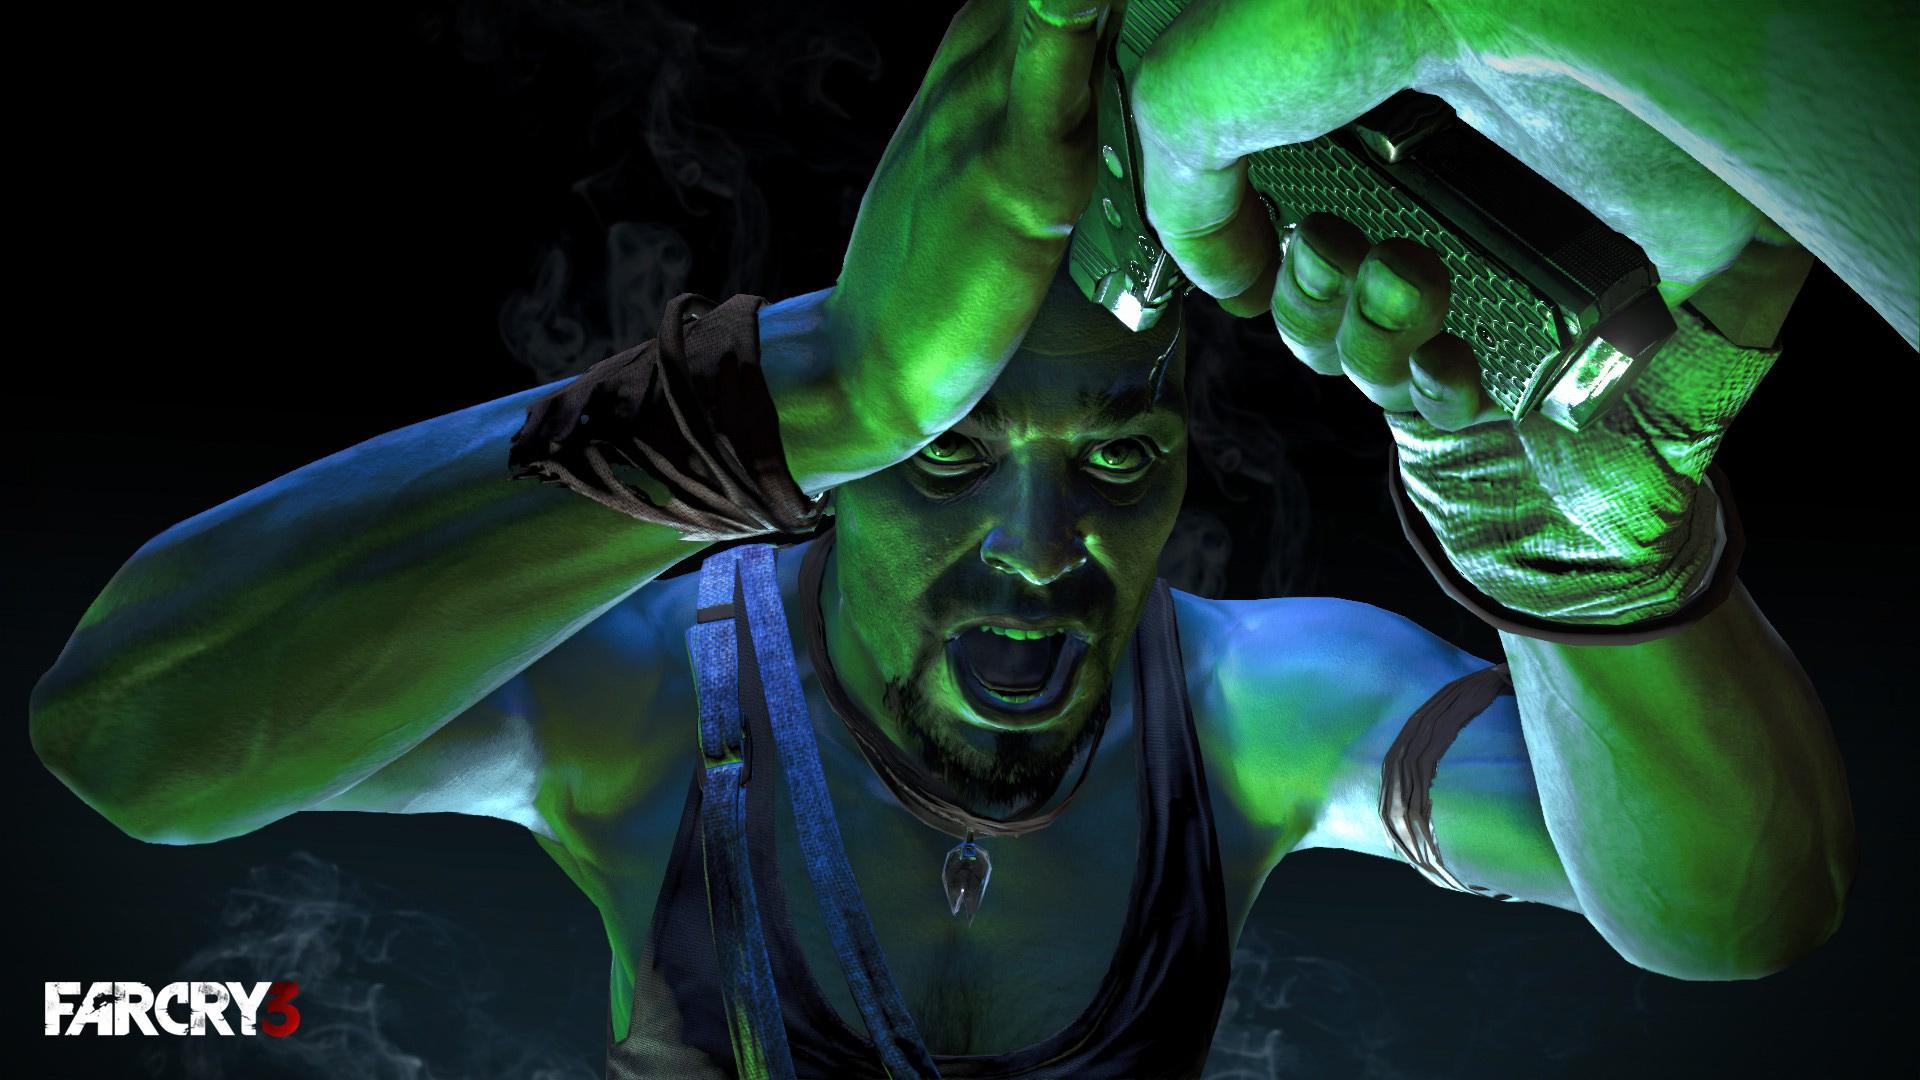 PlayStation's July Savings sale knocks Far Cry 3 Classic Edition down to $3 screenshot